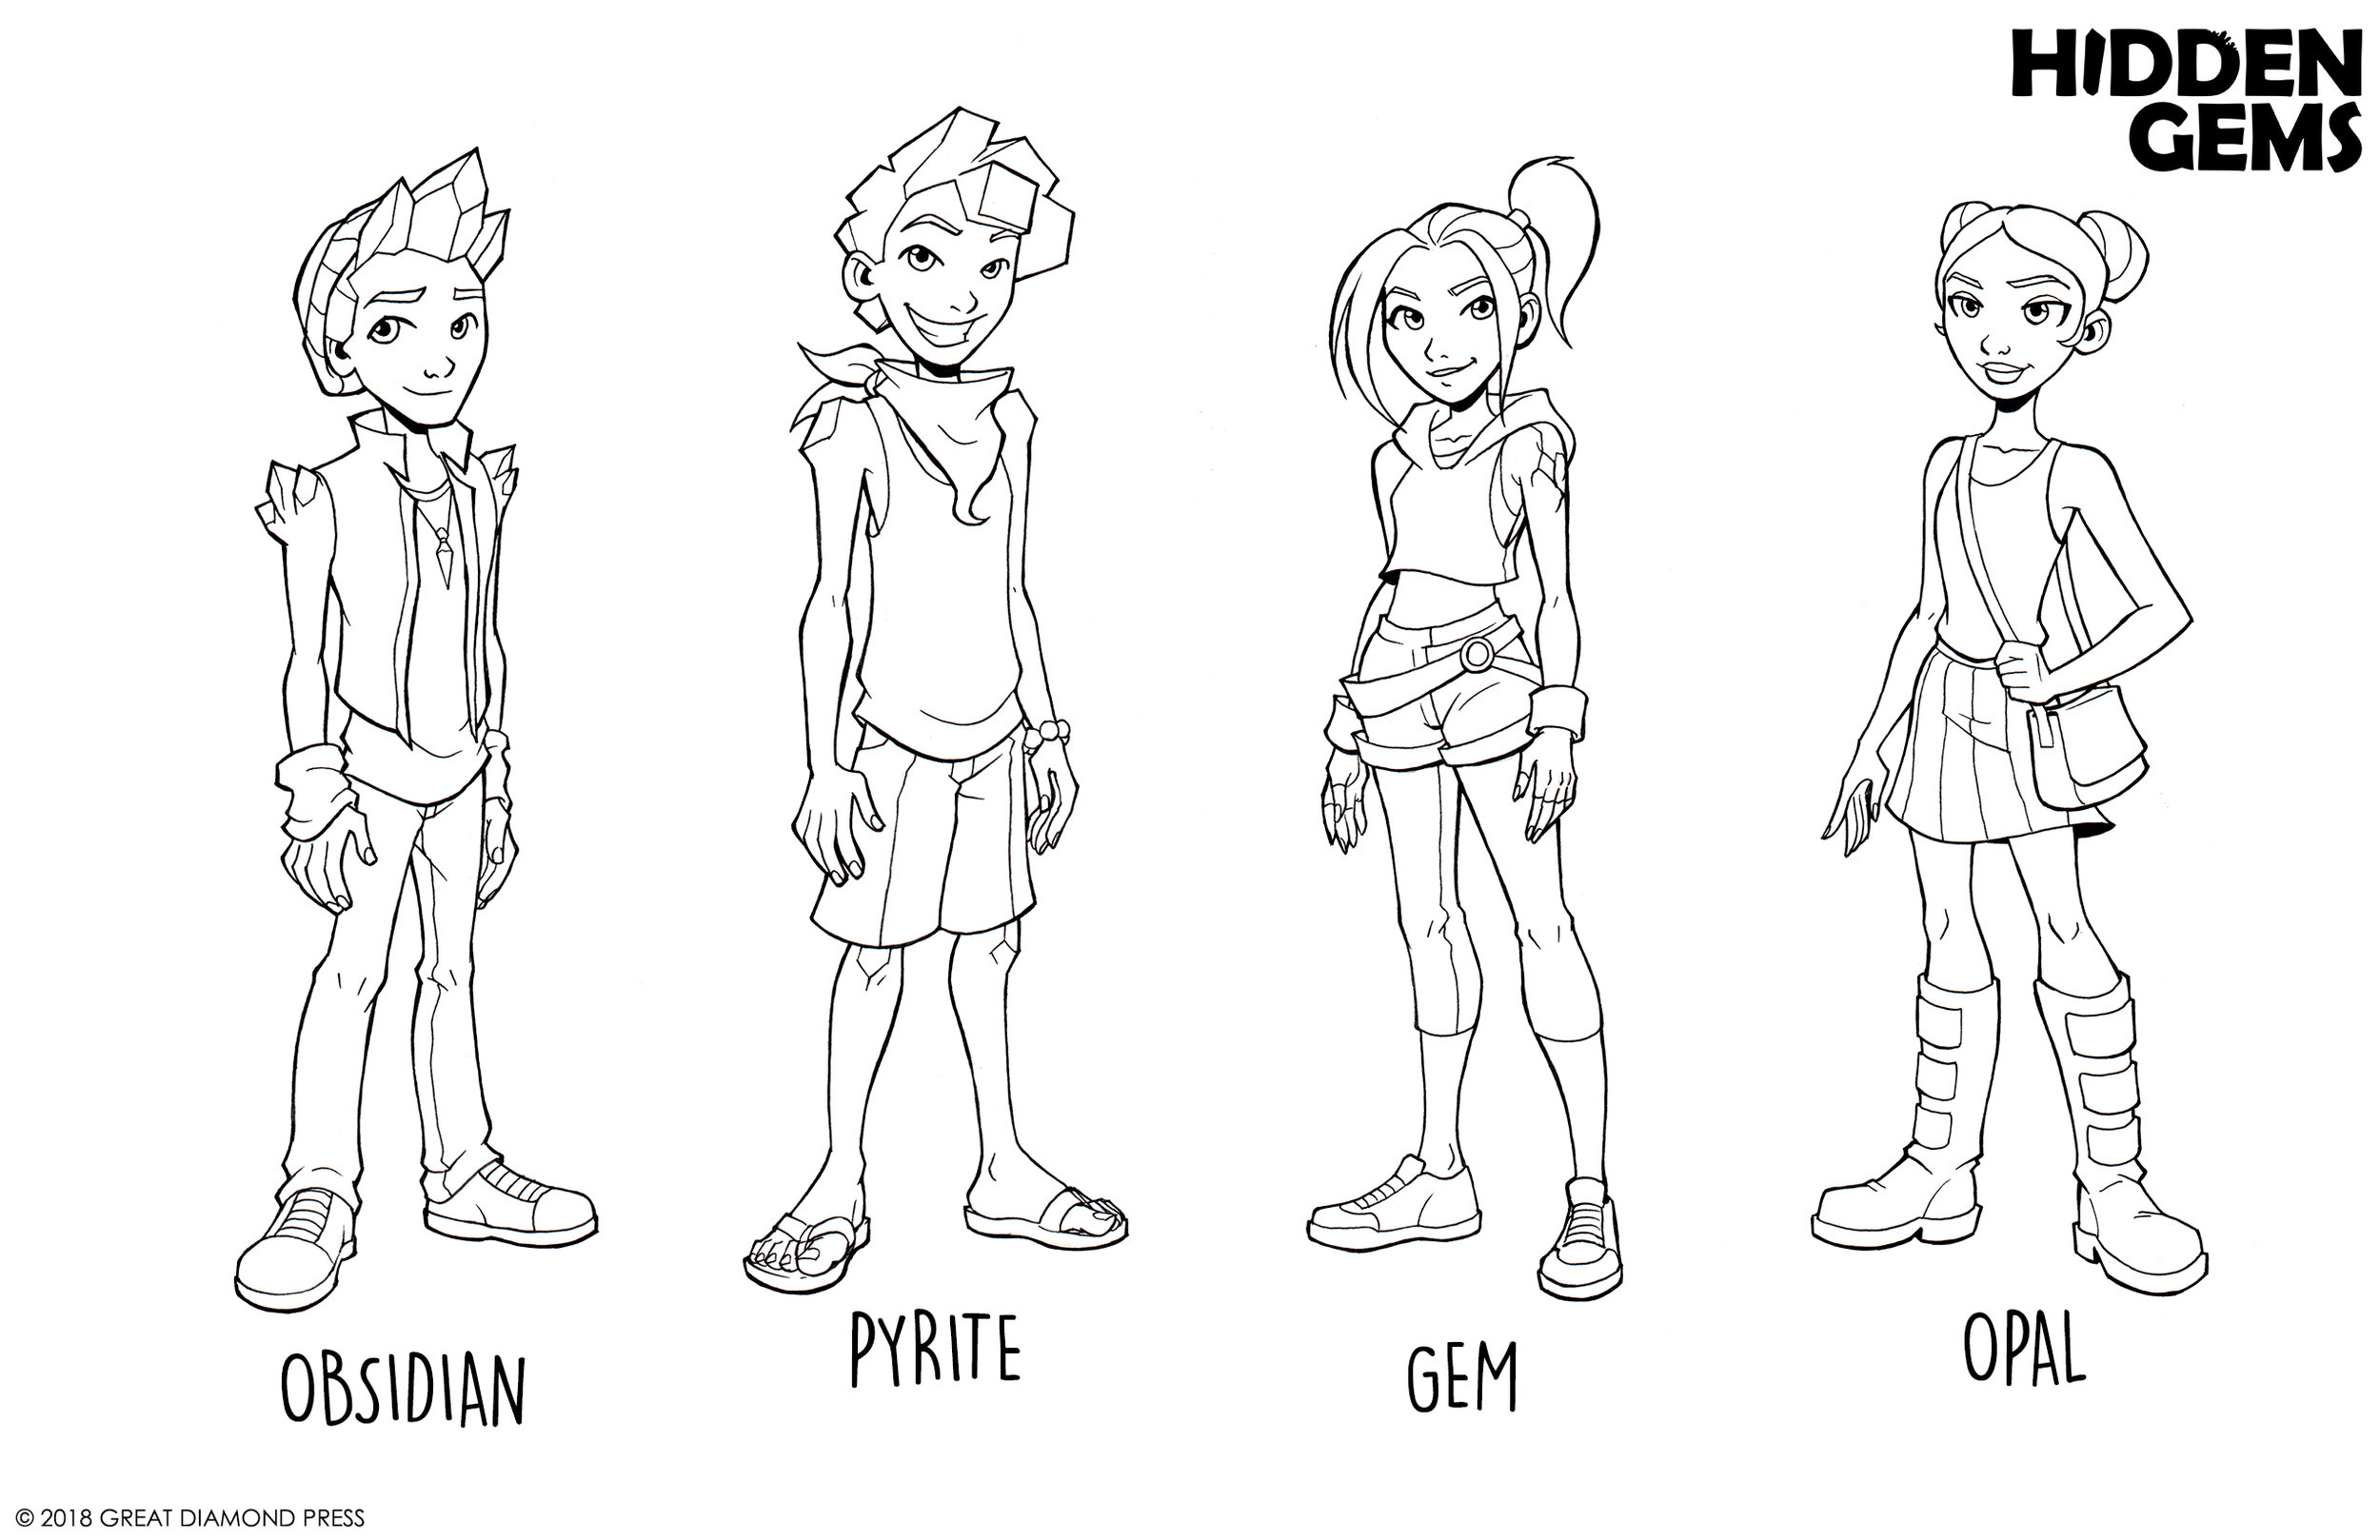 Illustrations by Joel Sigua